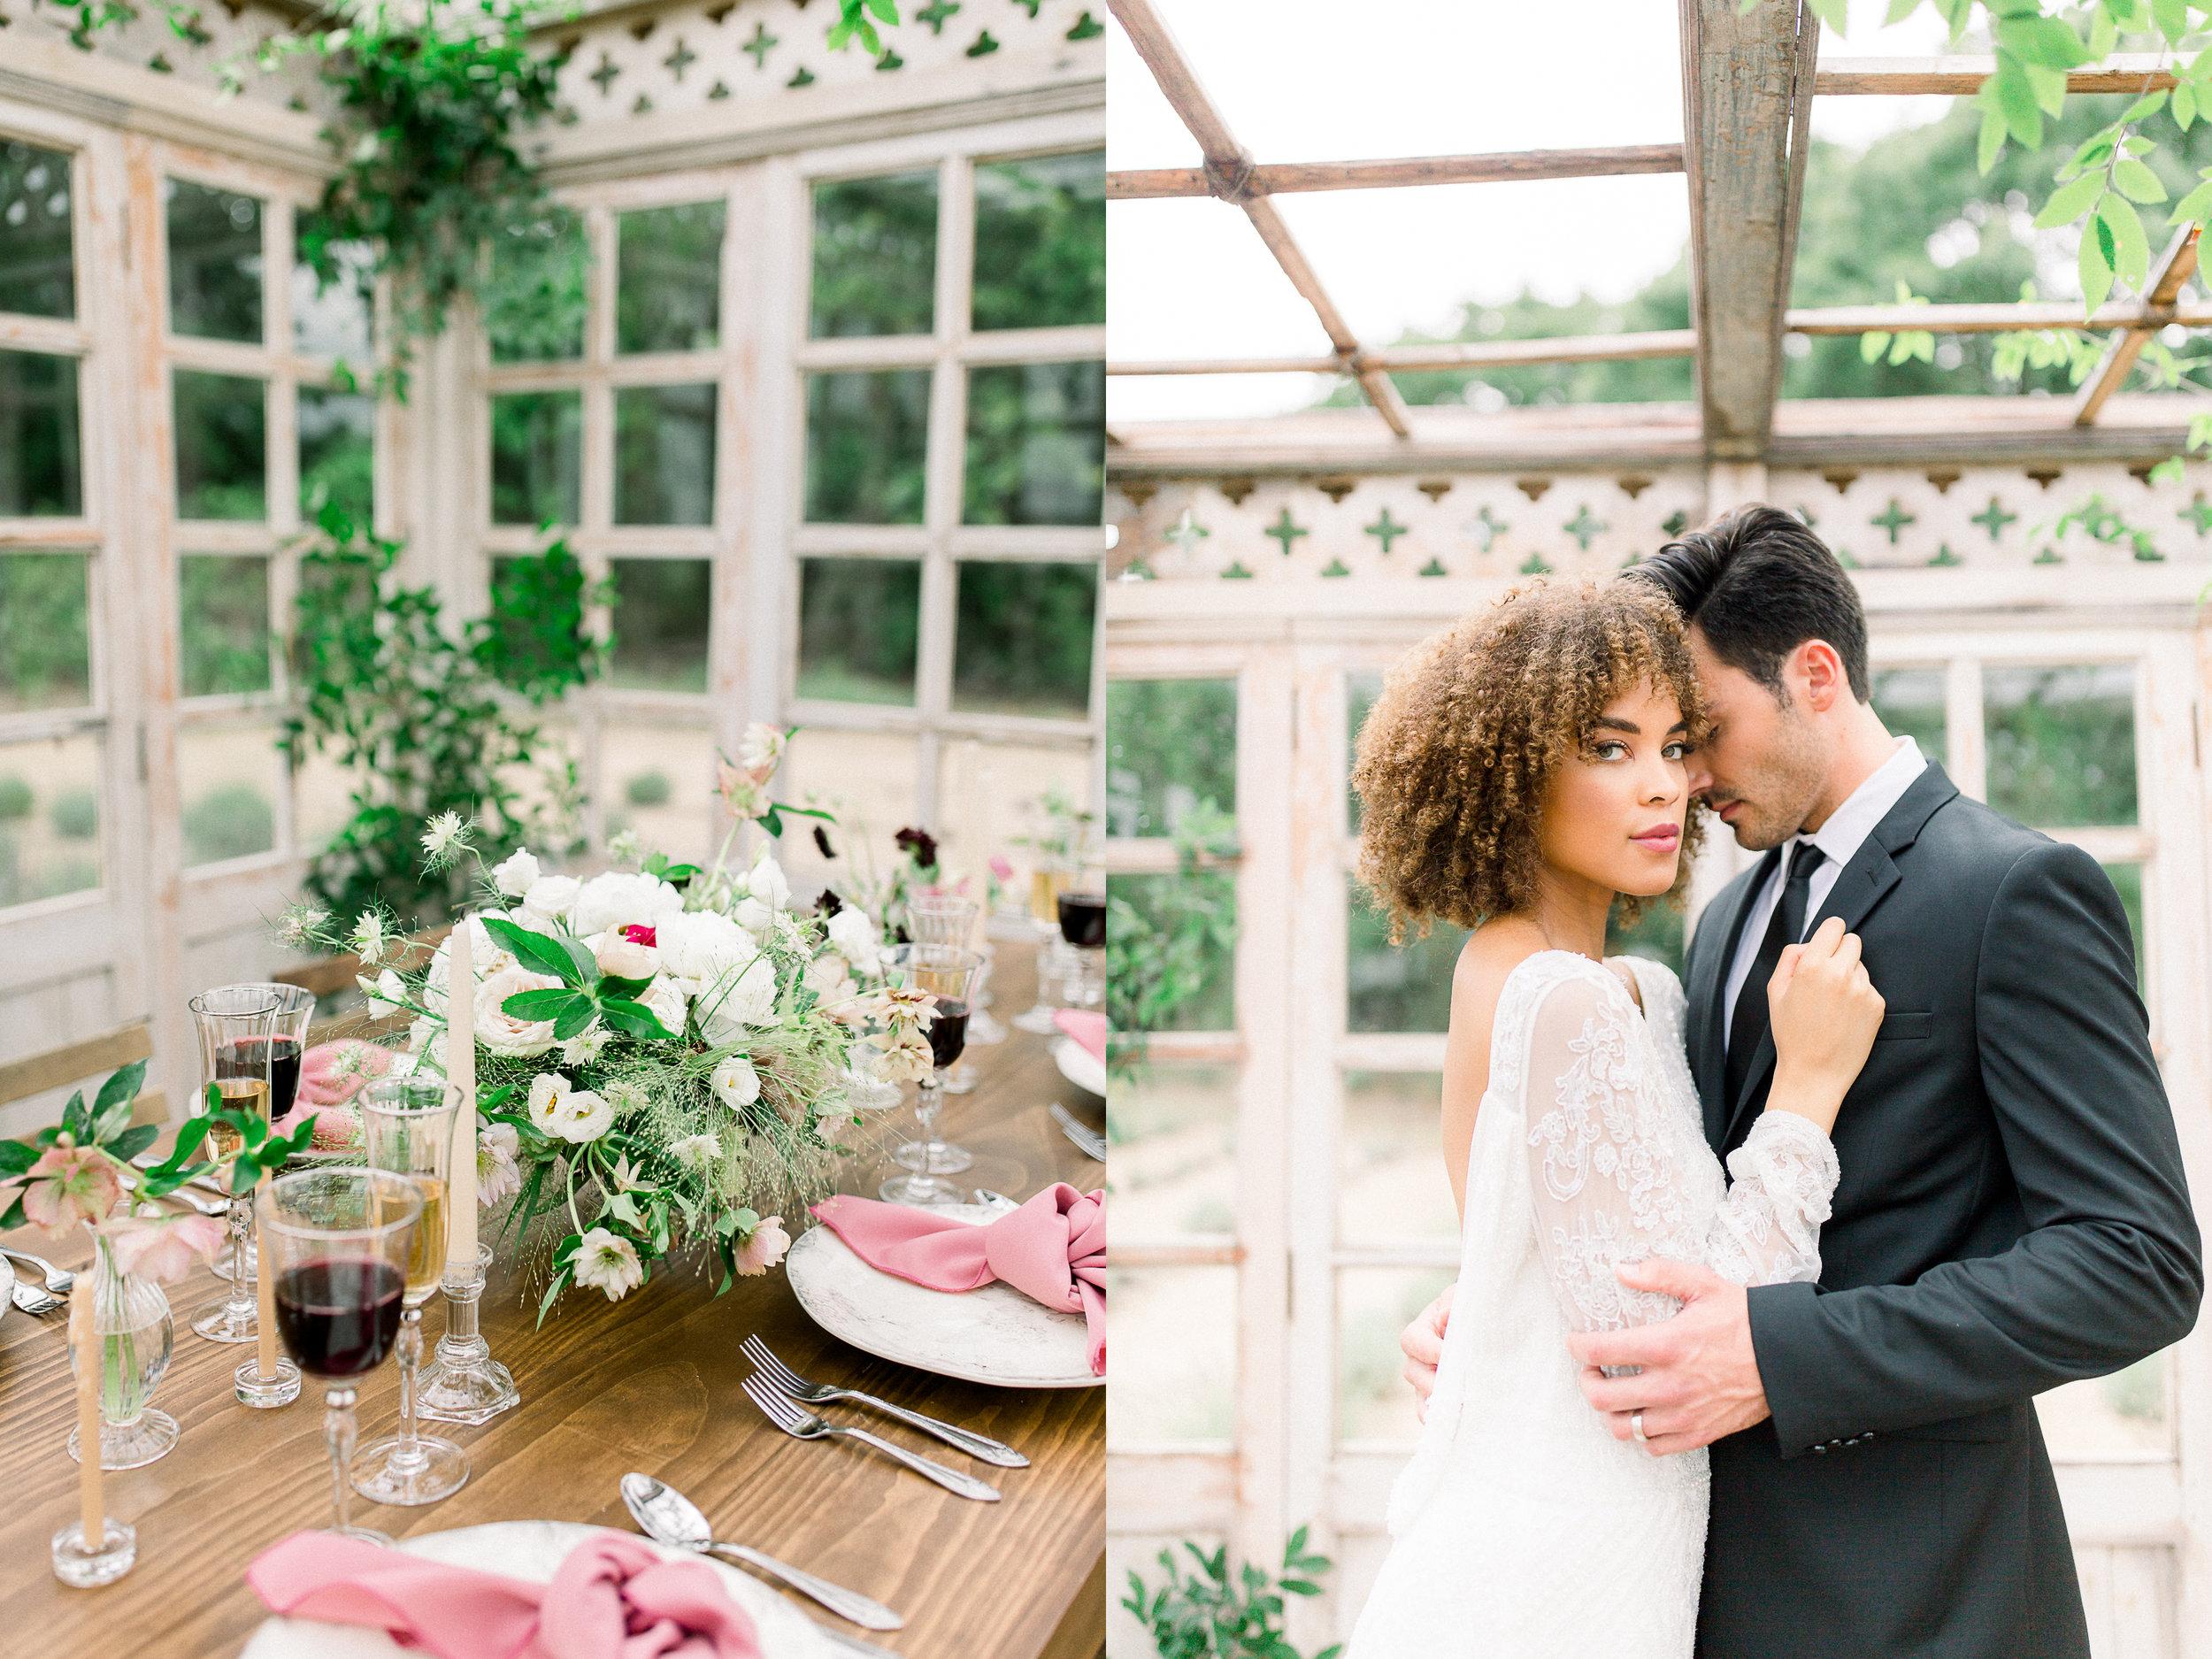 The White Sparrow - Lavender Field Wedding - 1.jpg